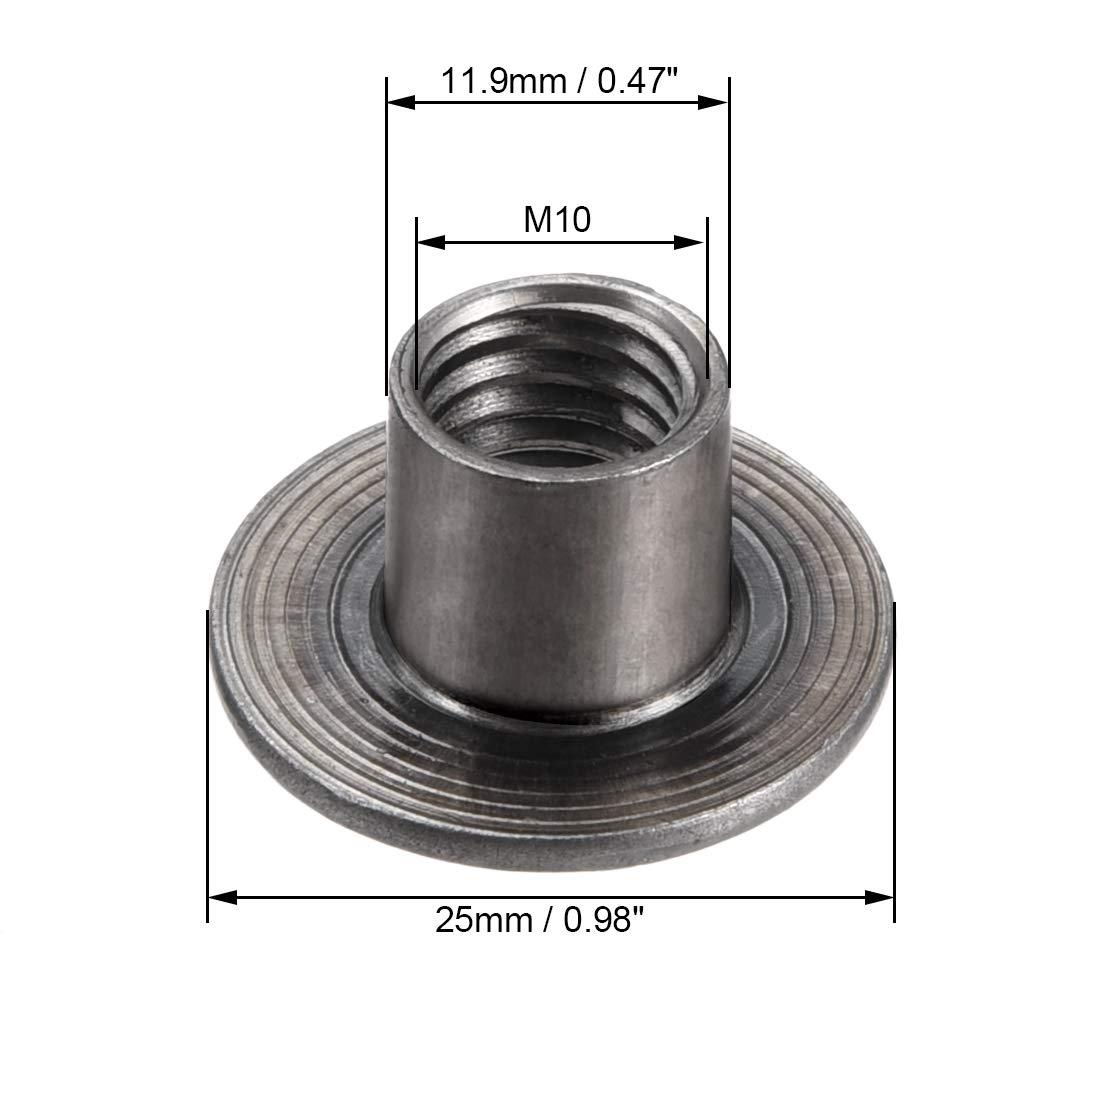 1Mm 30 piezas sourcing map Tuercas en forma en T de acero al carbono base redonda para enroscar atornillar con agujero de M4x15x1